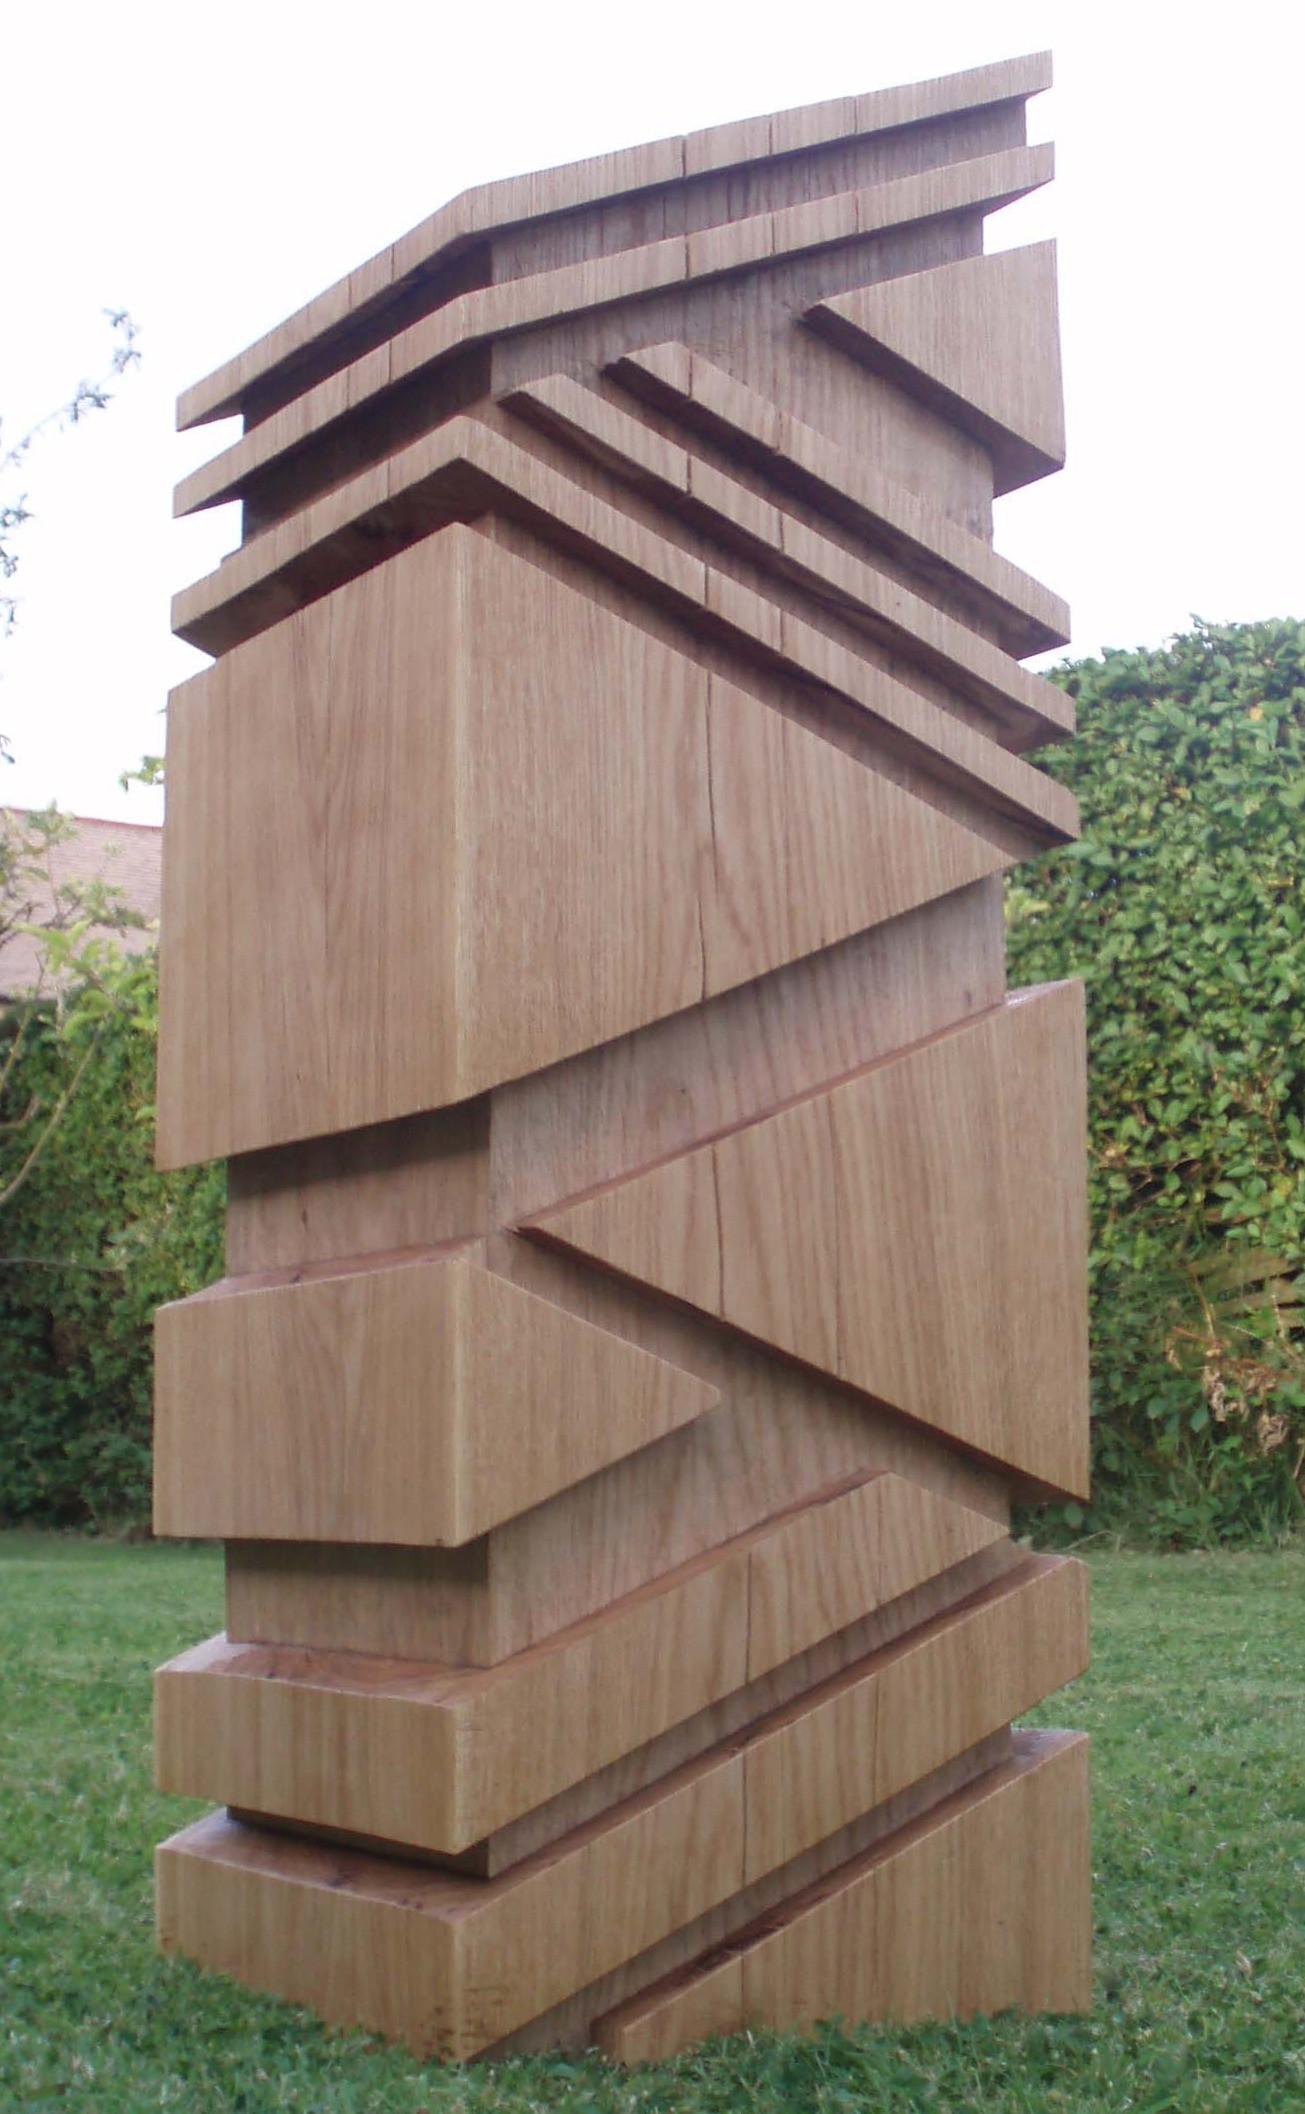 angledOak_SpencerJenkins_GreenOaksculptu